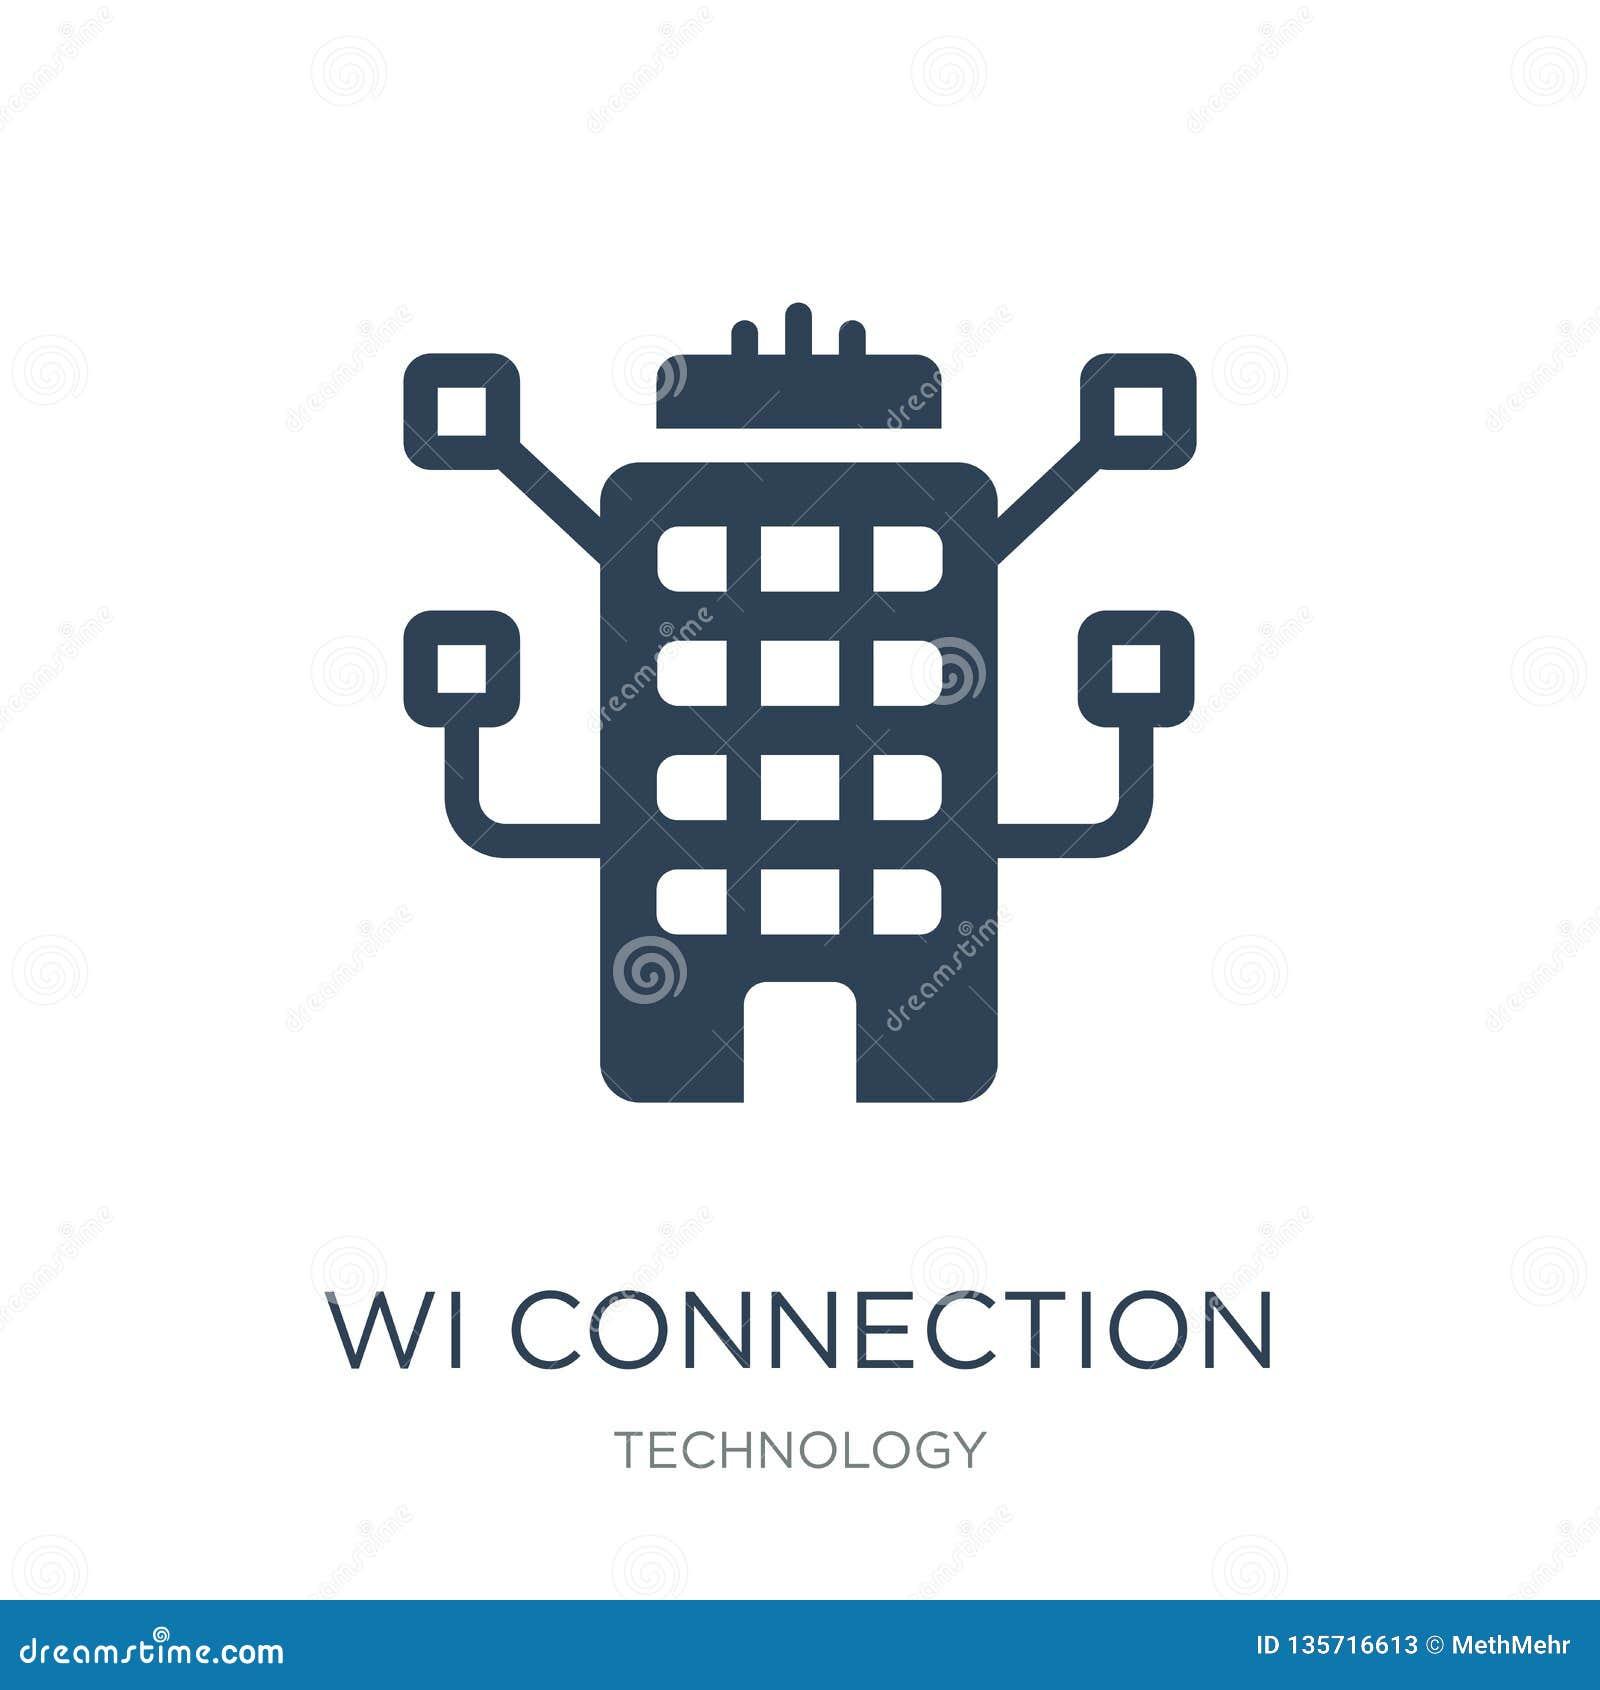 Wi-anslutningssymbol i moderiktig designstil wi-anslutningssymbol som isoleras på vit bakgrund enkel symbol för wi-anslutningsvek